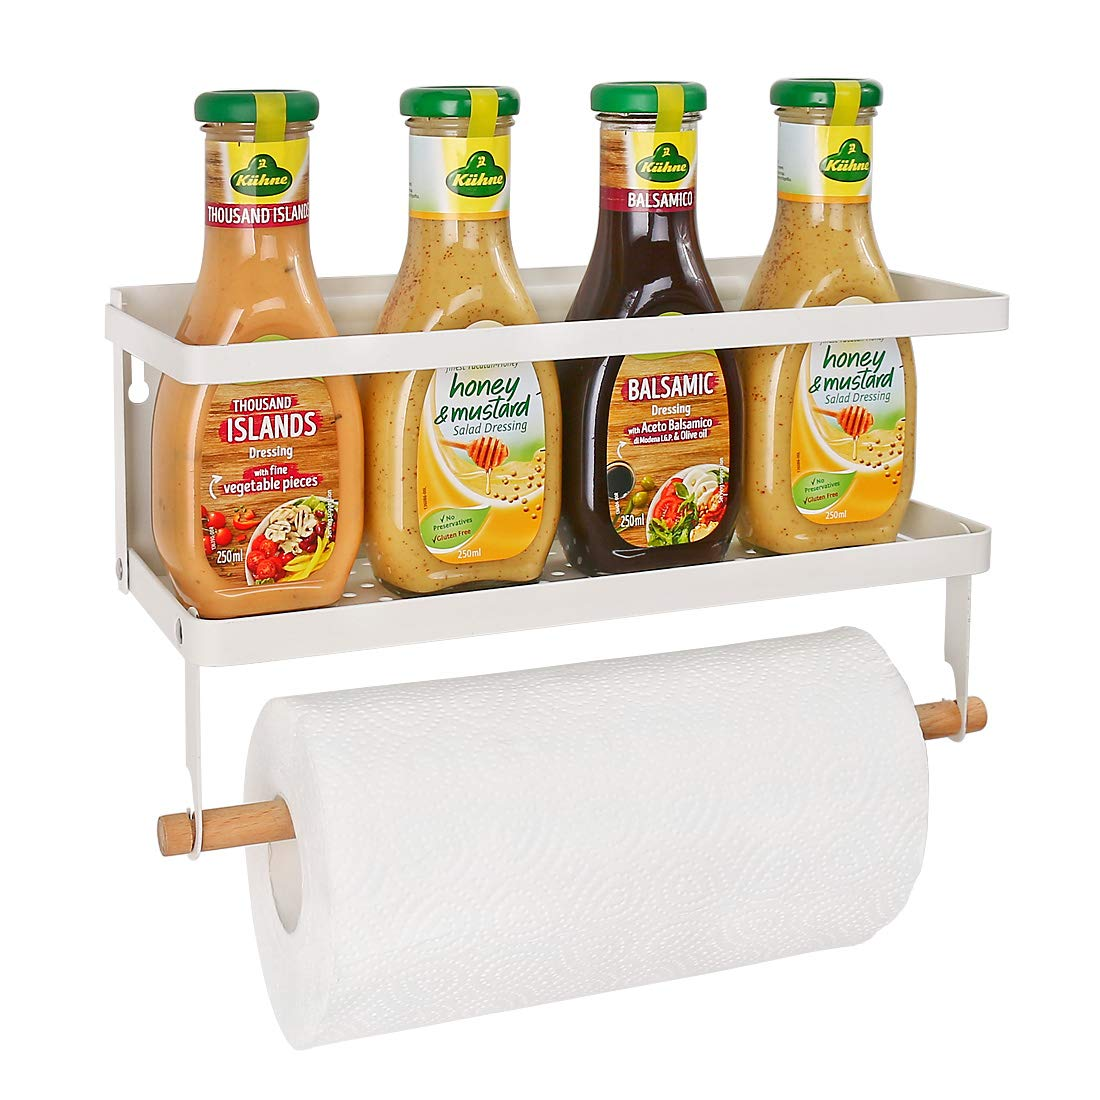 Haturi Fridge Spice Rack, Magnetic Storage Shelf with Paper Towel Holder Single Tier Kitchen Refrigerator Organizer Rack (Small,White)